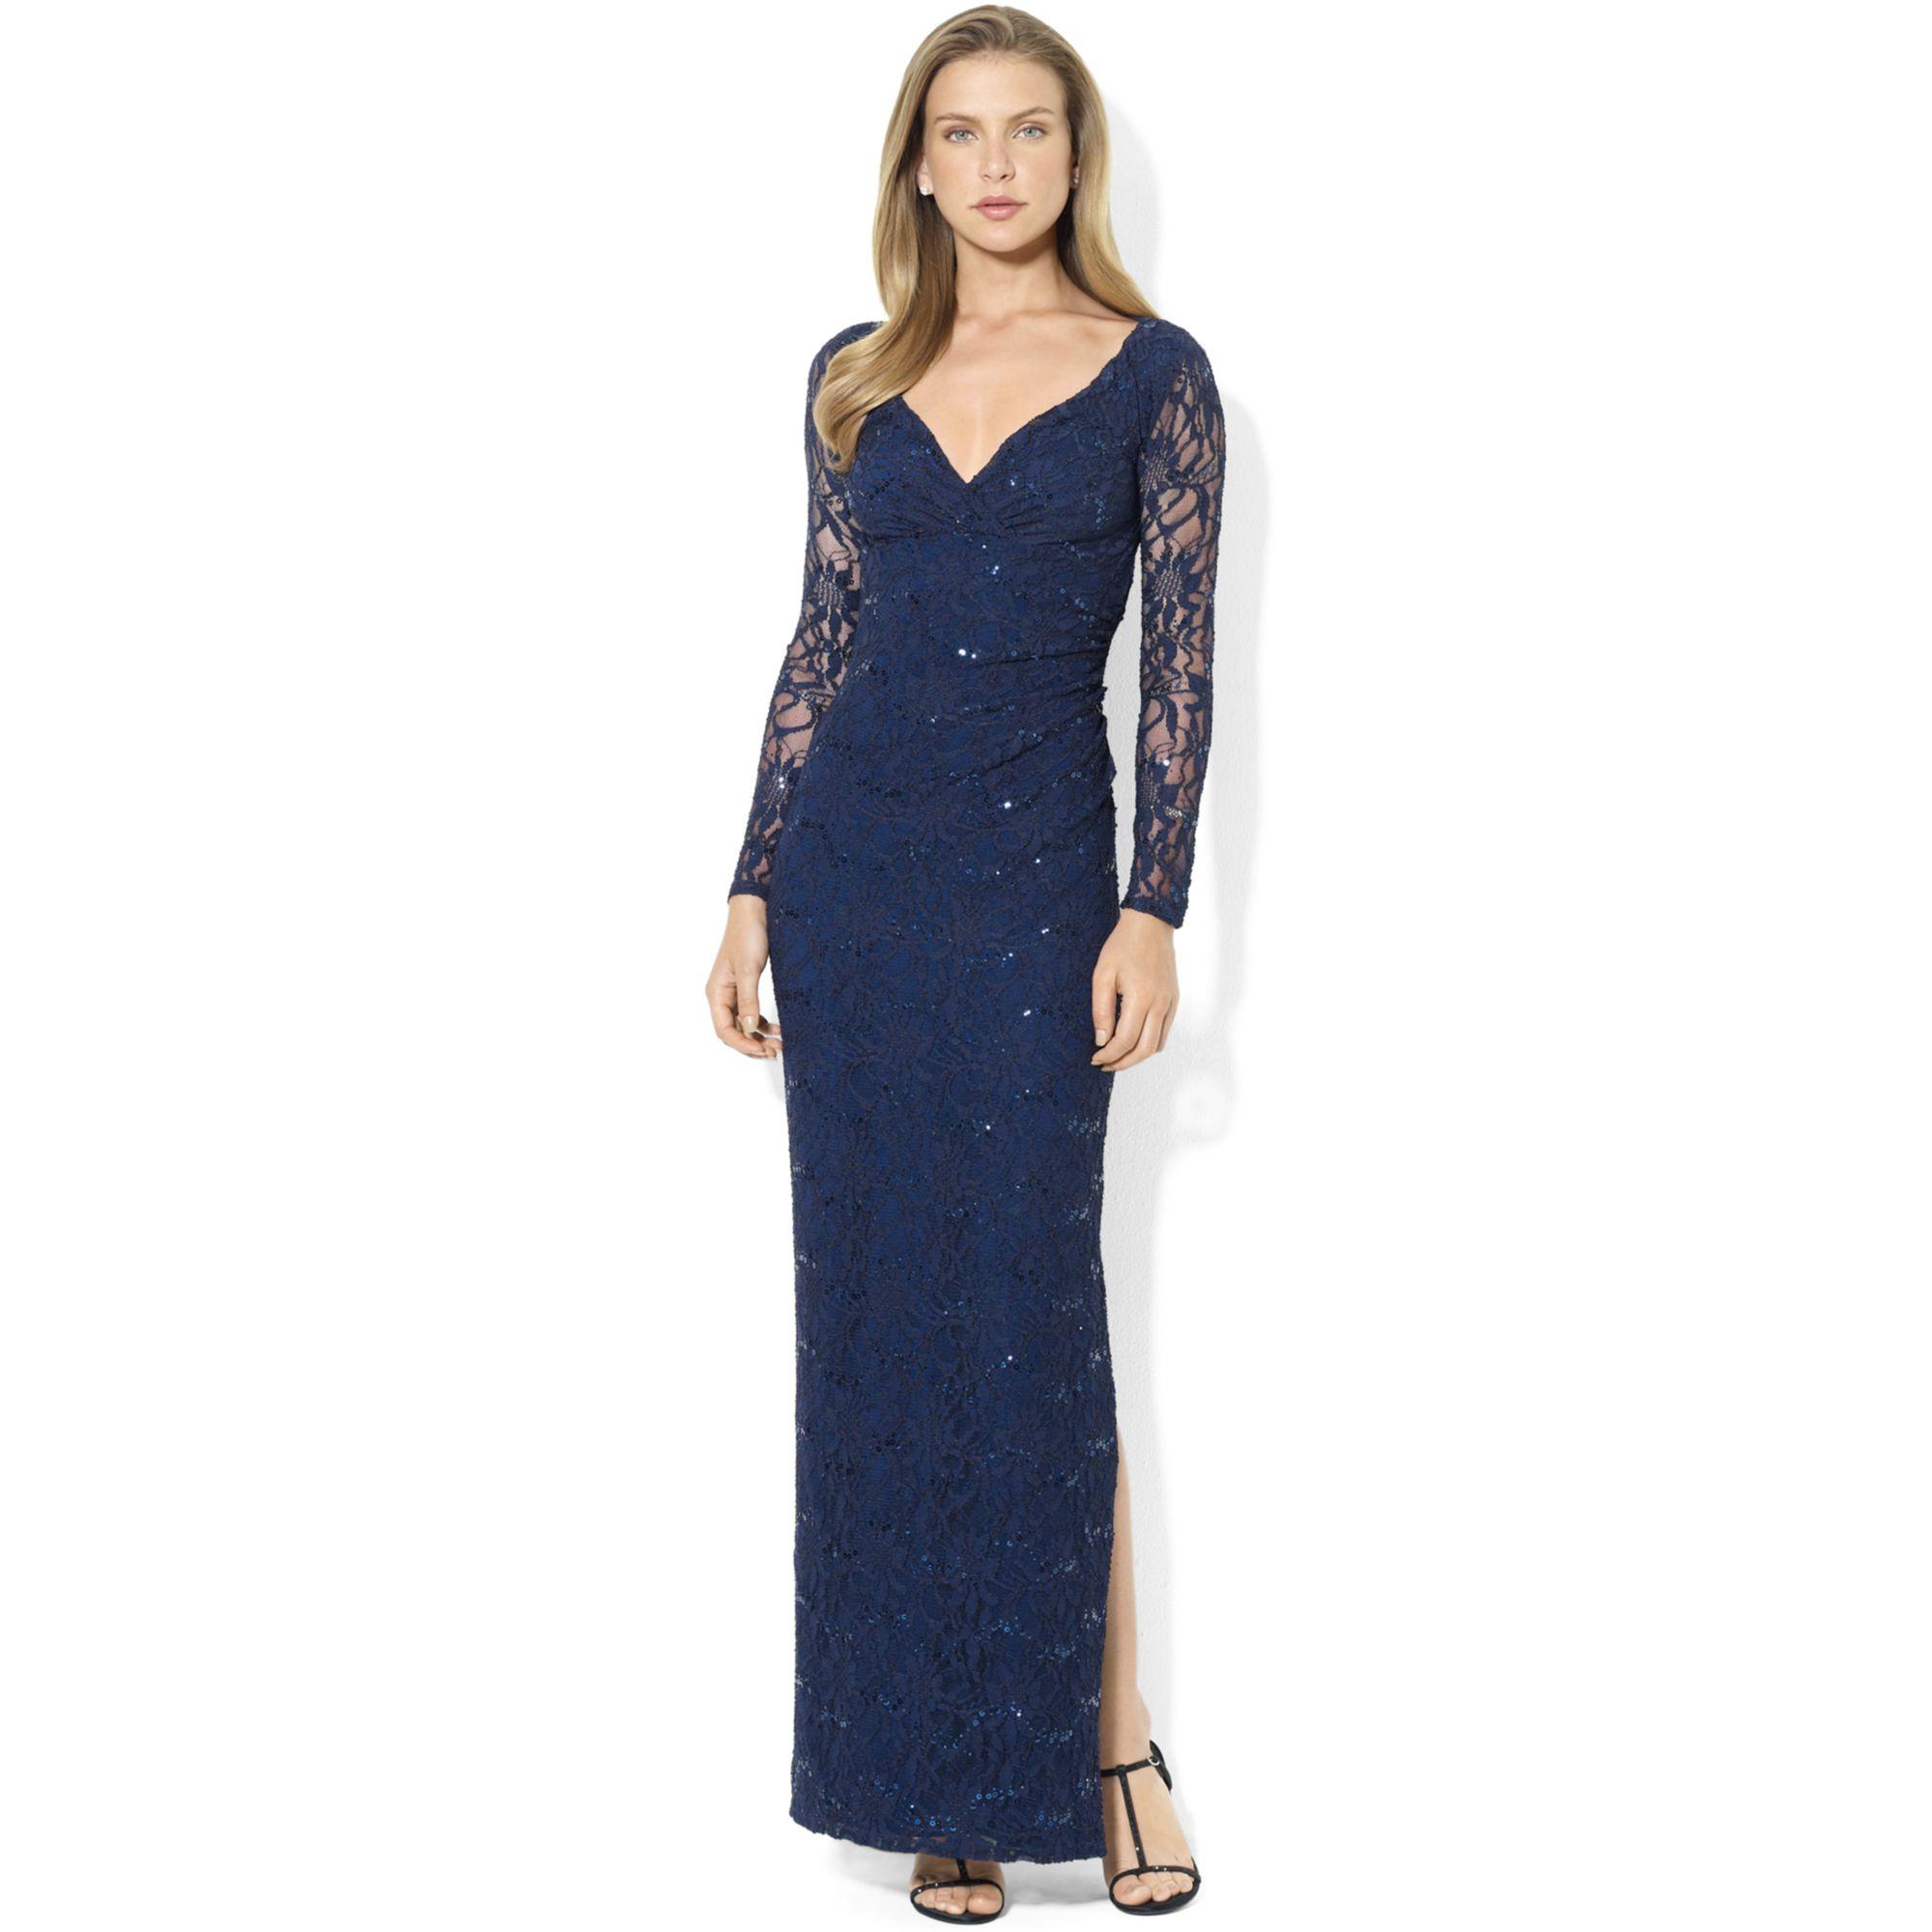 Lyst - Lauren By Ralph Lauren Longsleeve Lace Sequin Gown in Blue